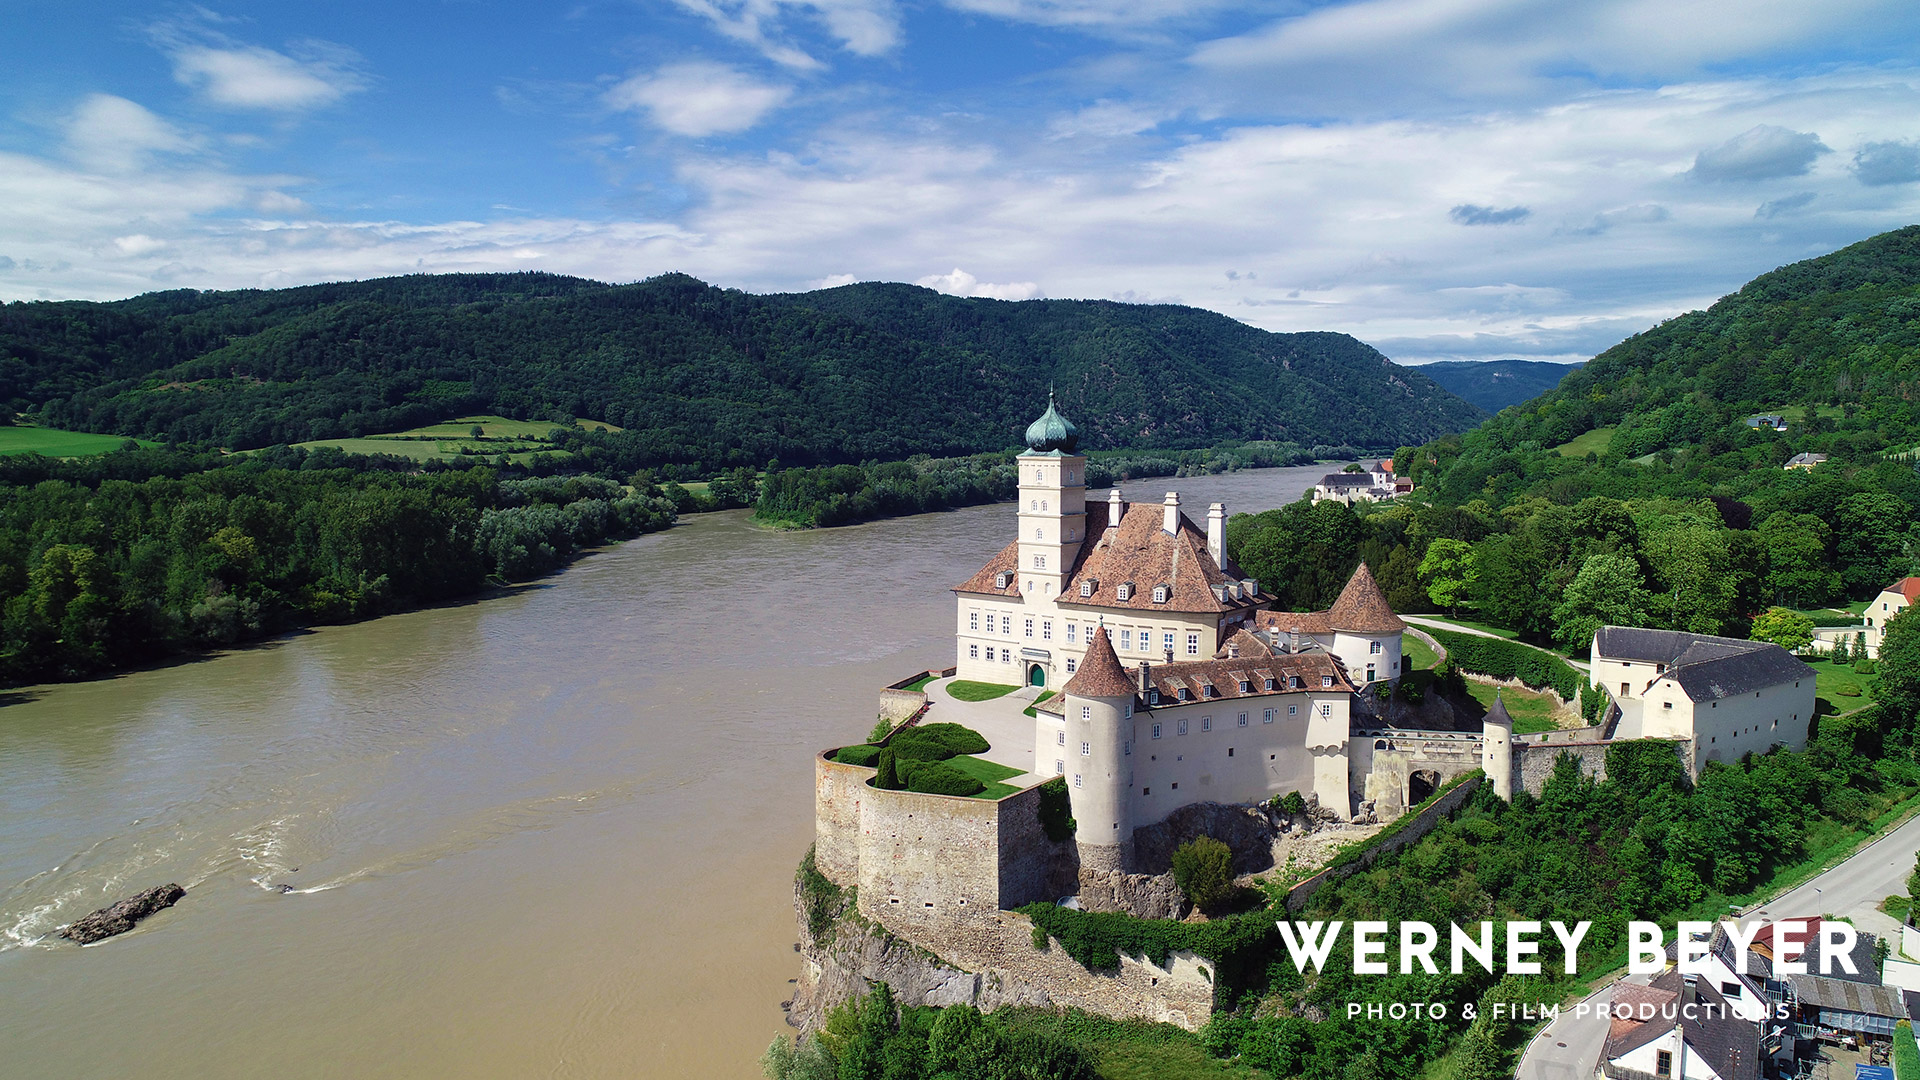 Palace Schoenbuehel, Wachau, River Danube, Austria